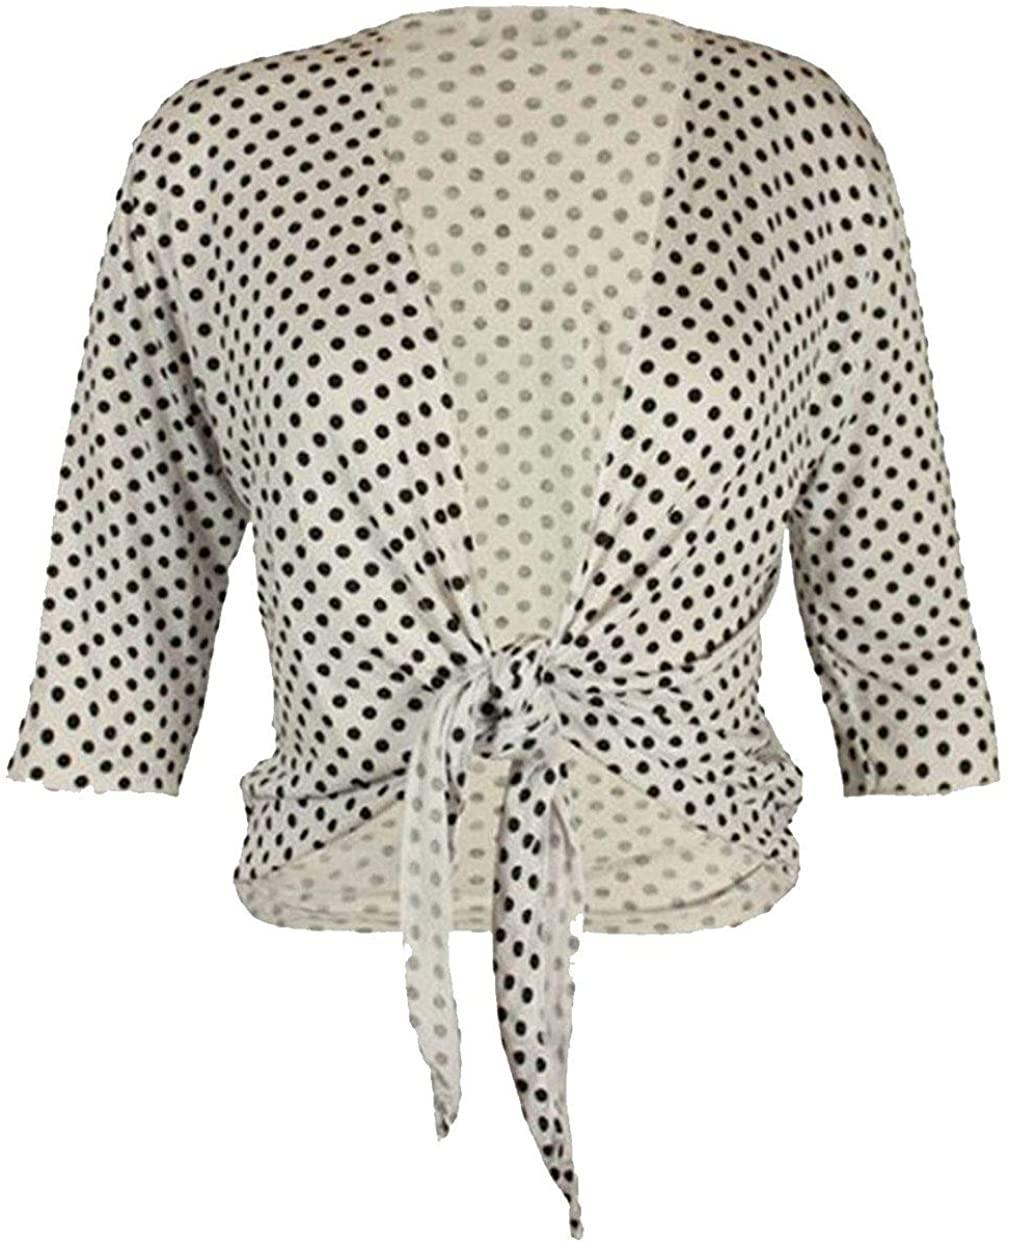 Rimi Hanger Womens Polka Dot Tie Front Cropped Shrug Ladies 3/4 Sleeve Bolero Cardigan Top US 10-24